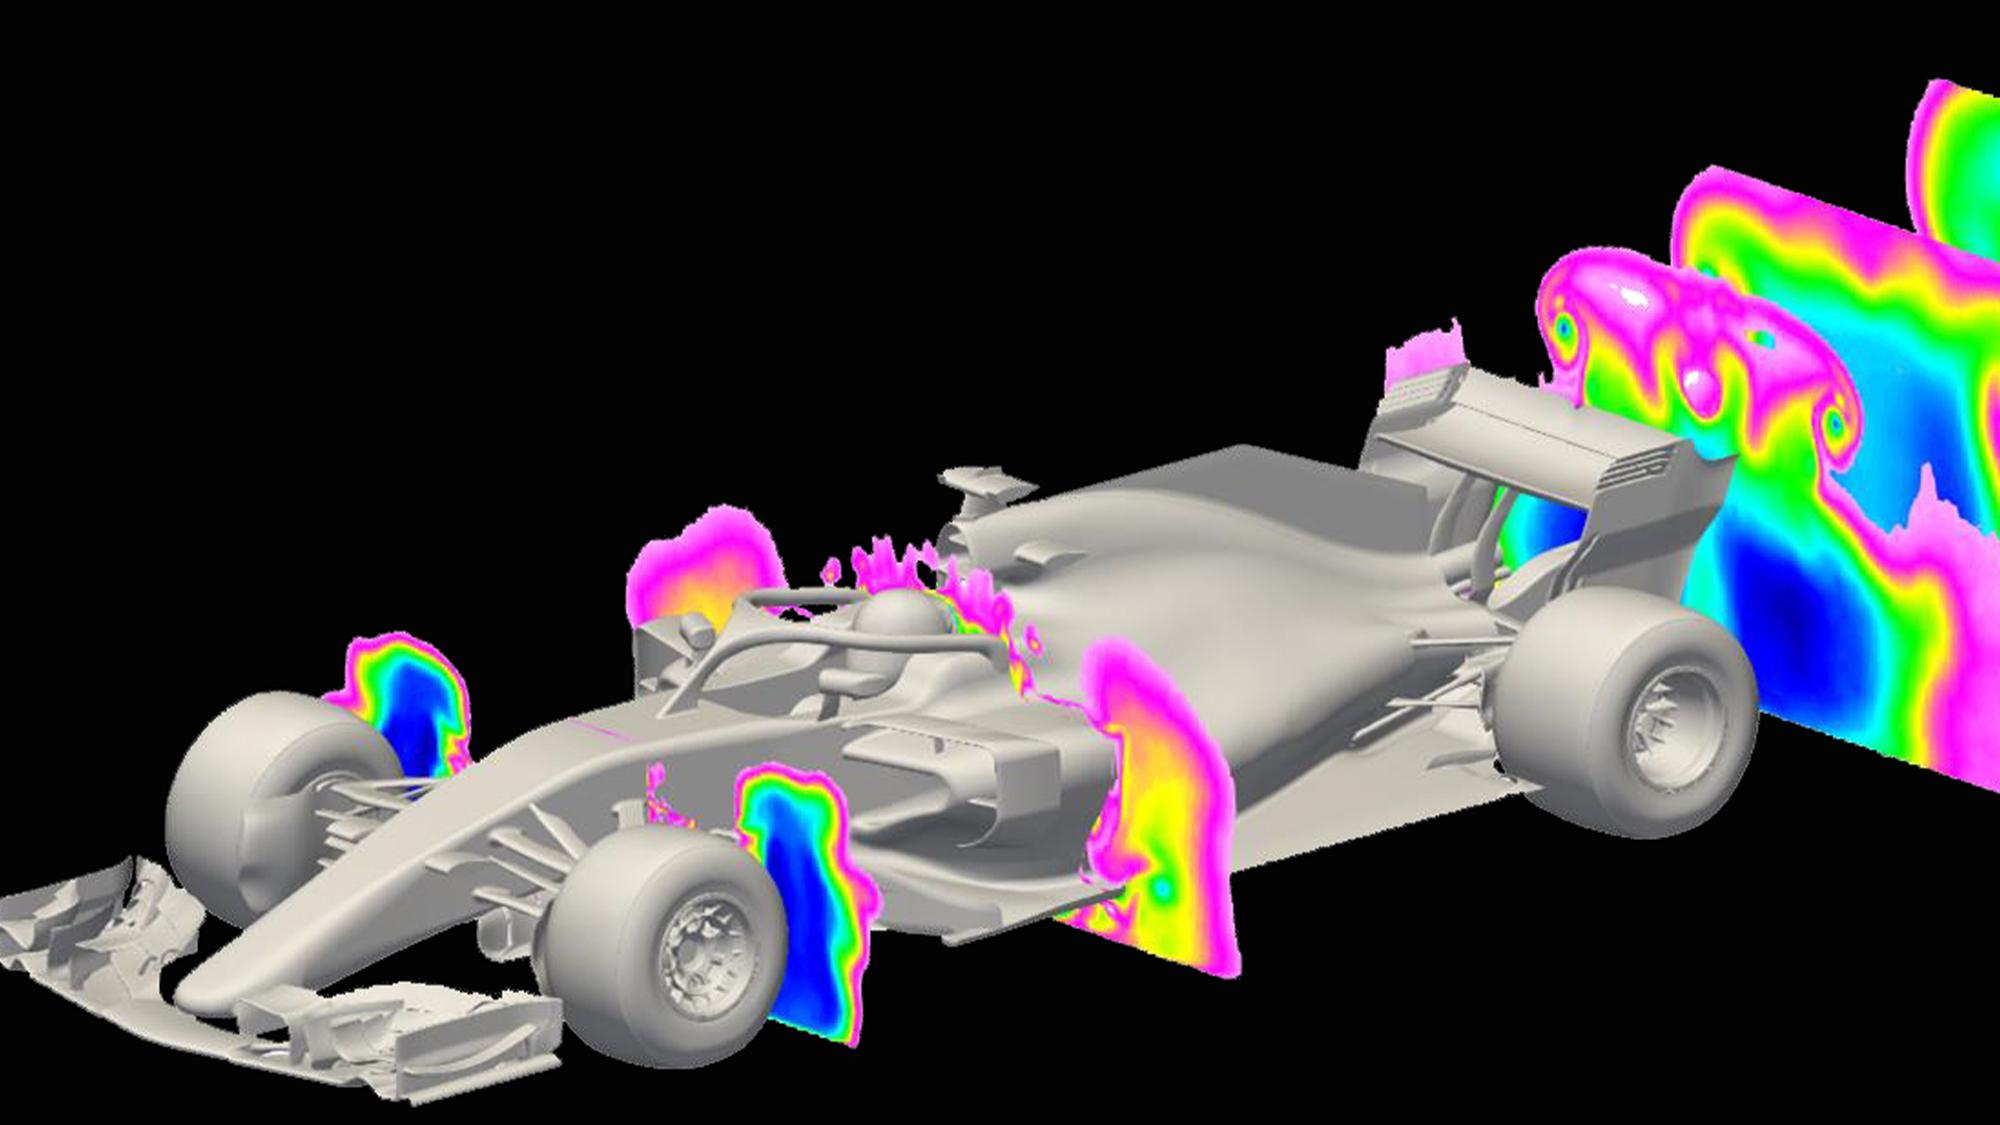 Aero wake on a 2018 F1 car